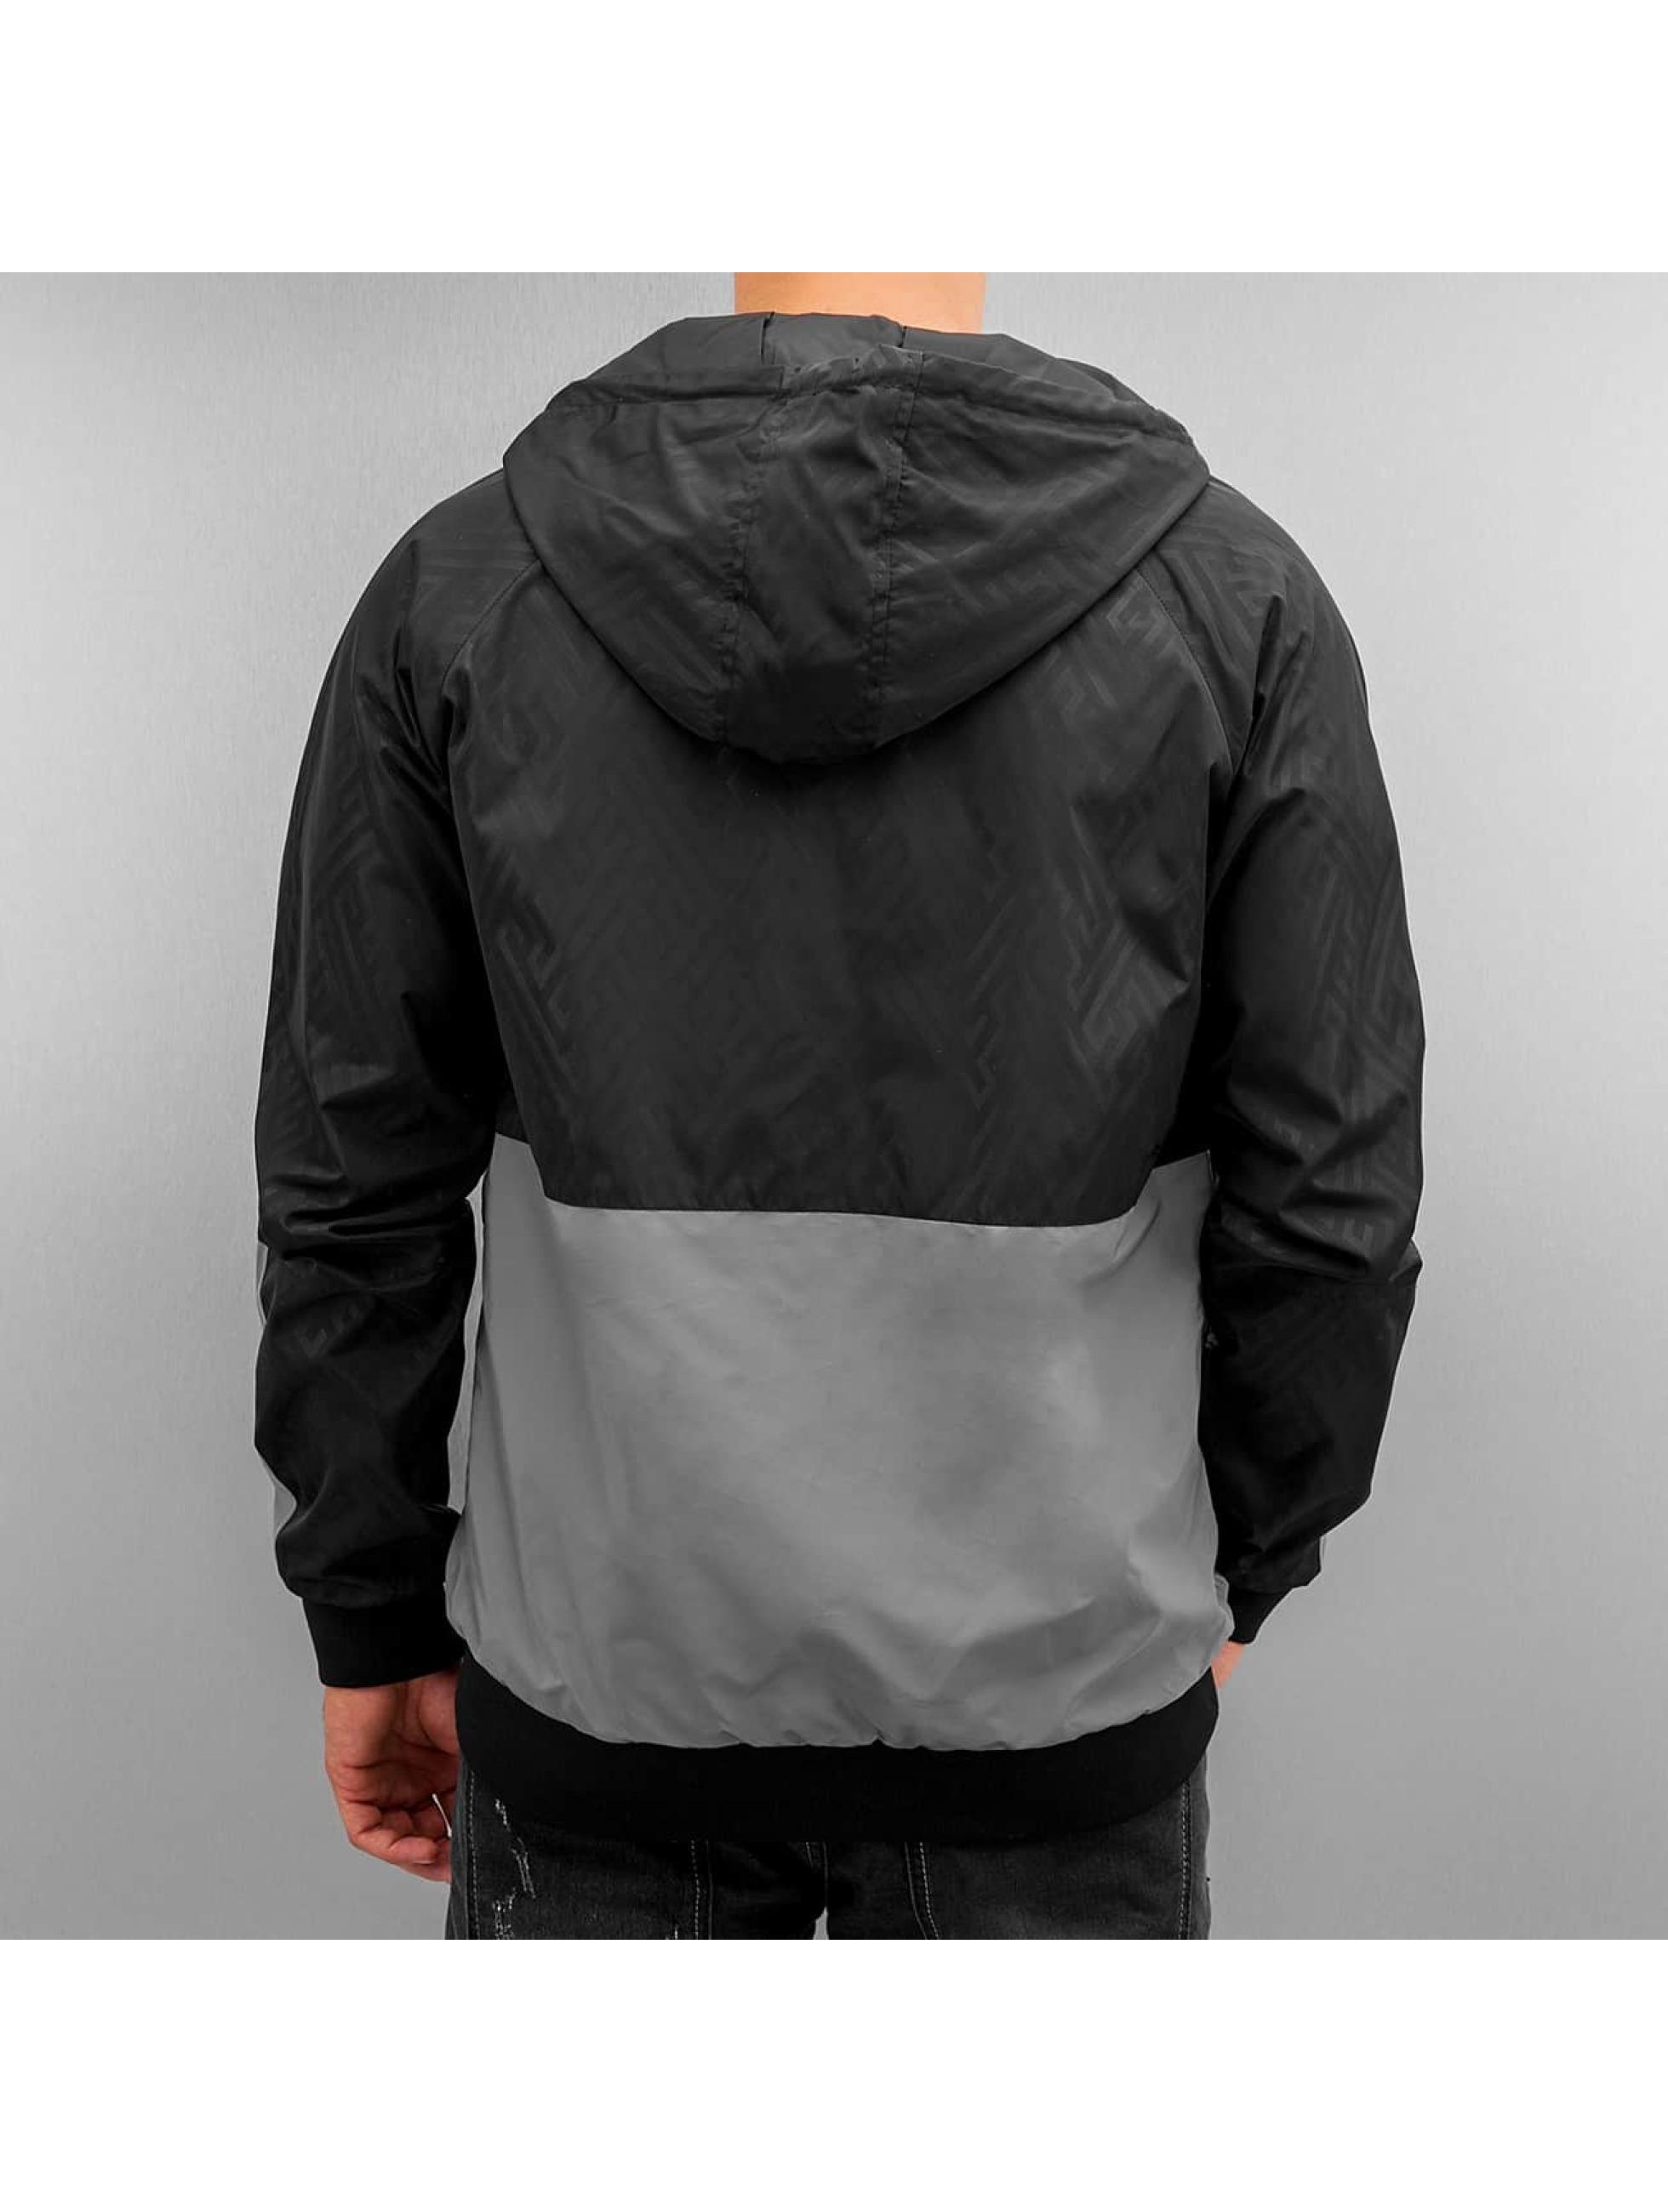 Pelle Pelle Демисезонная куртка Sayagata RMX черный